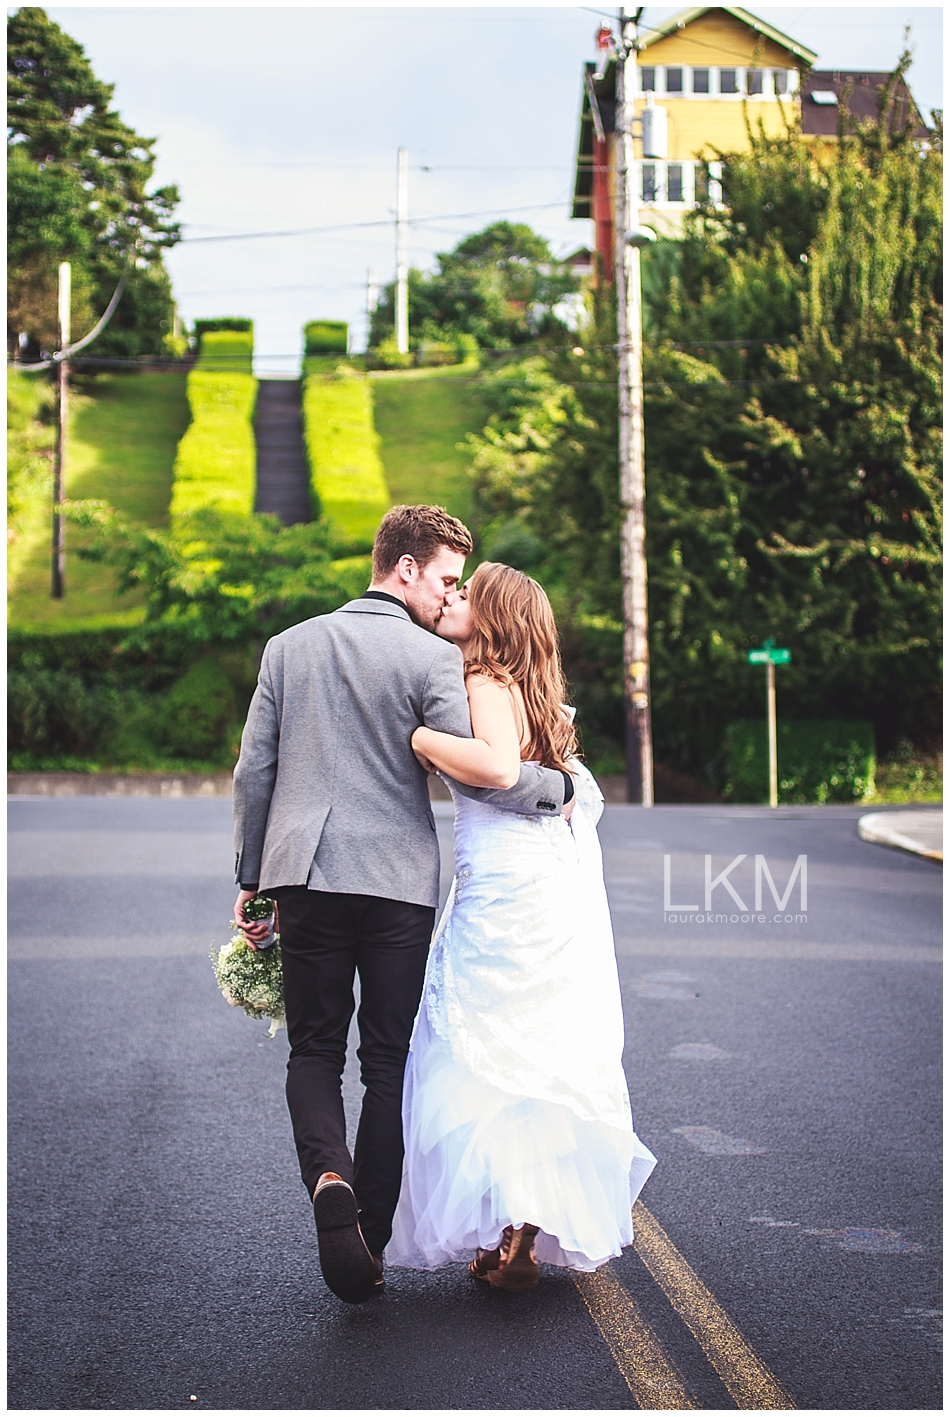 astoria-oregon-wedding-portland-laura-k-moore-destination-photographer-seth-joelle-weisser_0162.jpg